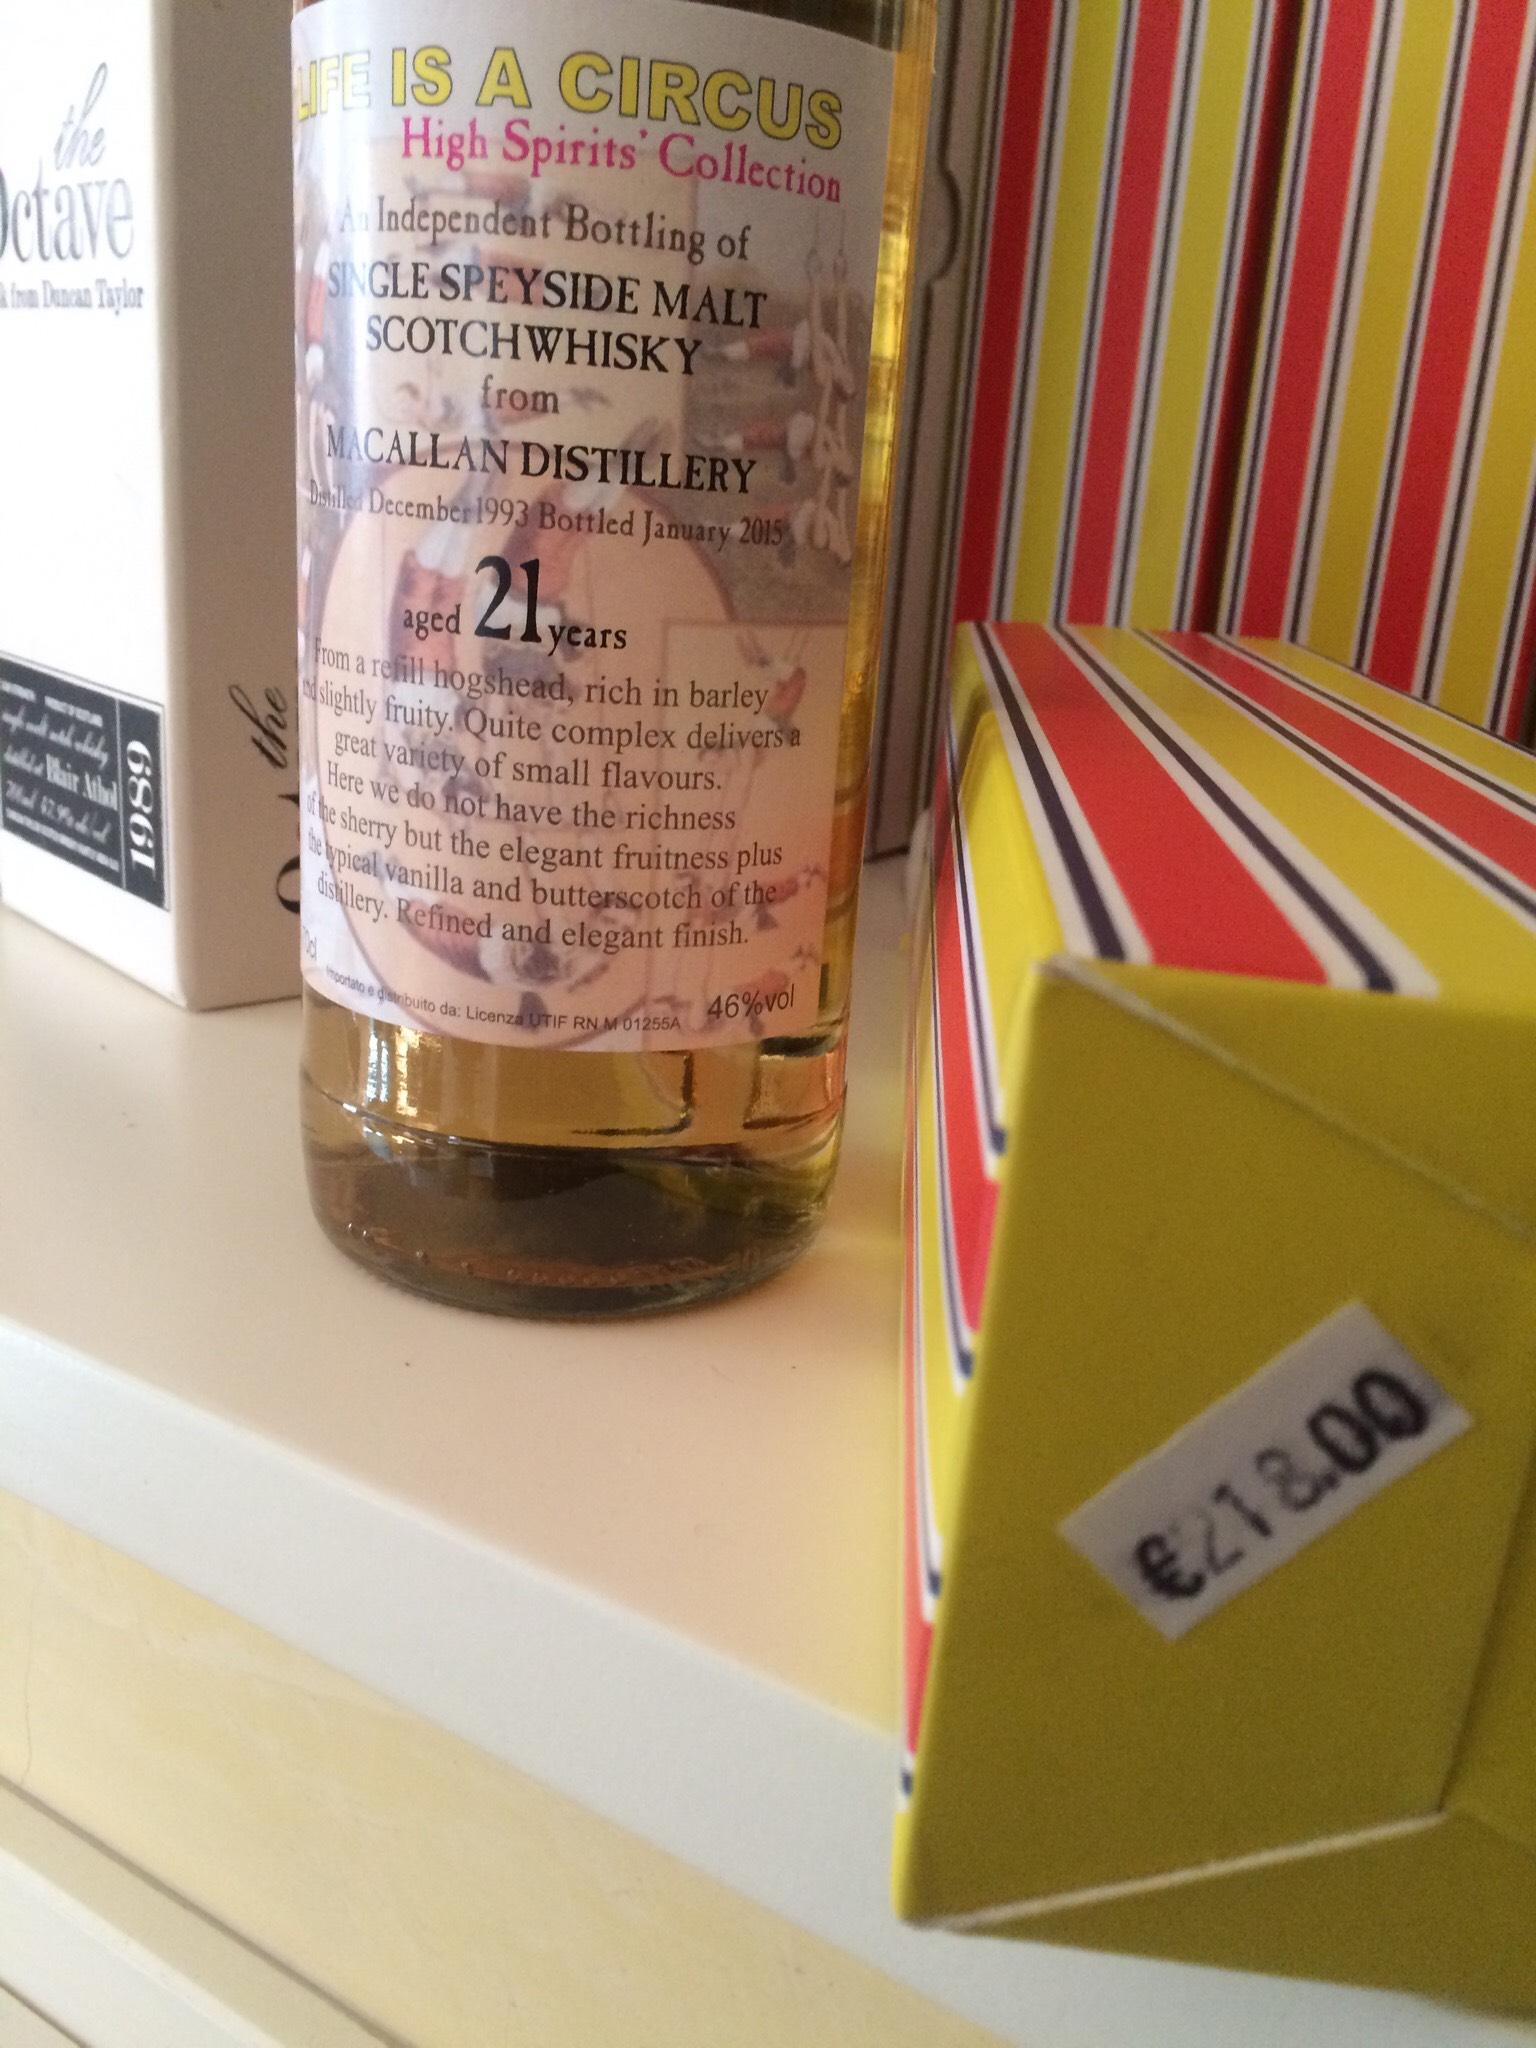 Lotto Bottiglie Miste Products